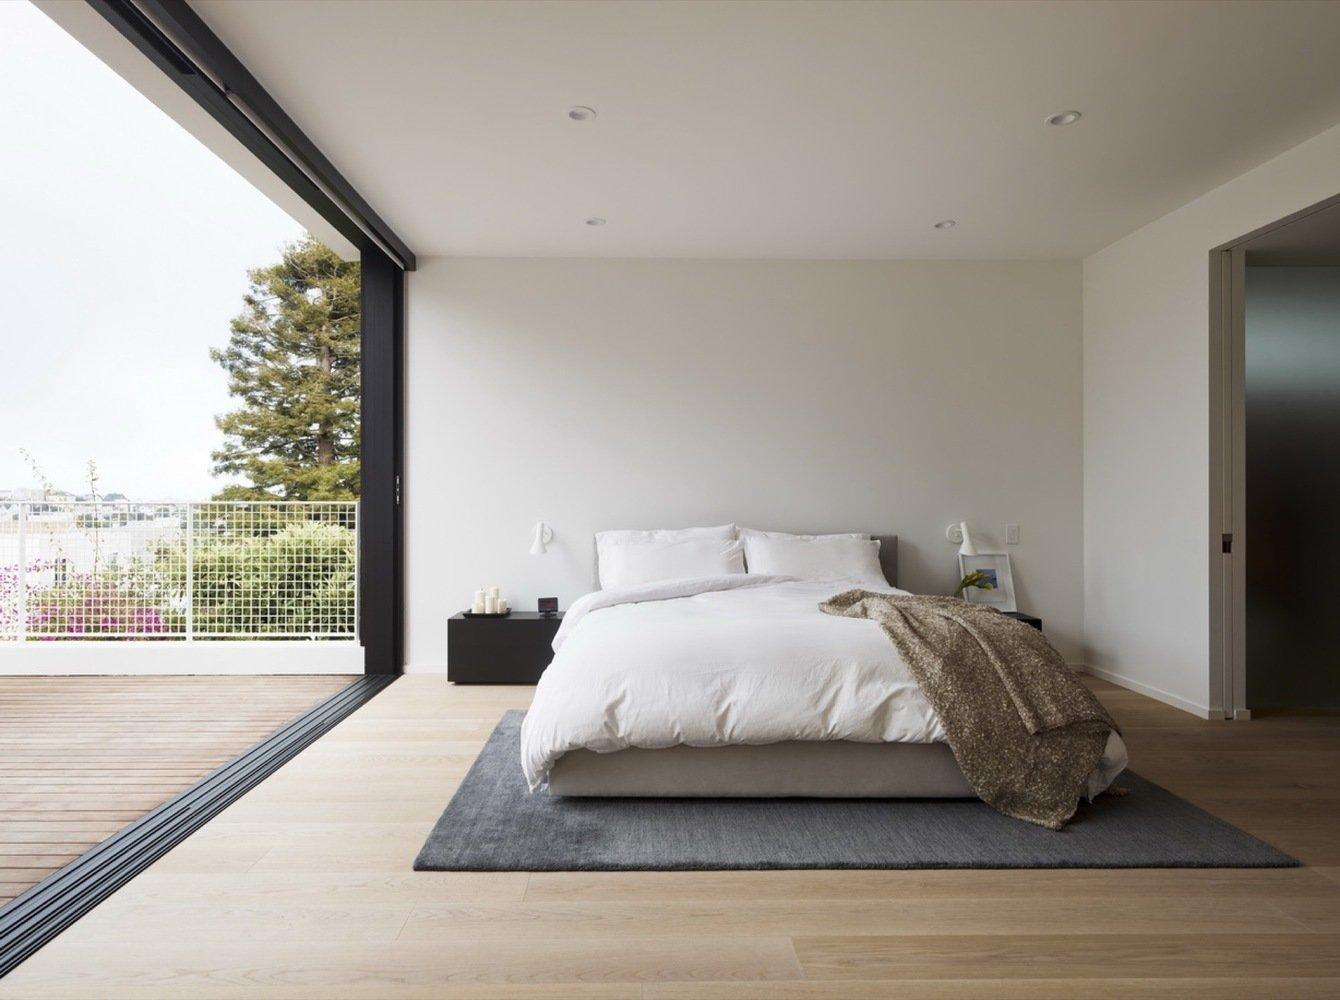 Bedroom, Bed, Recessed Lighting, and Light Hardwood Floor  Switchback House